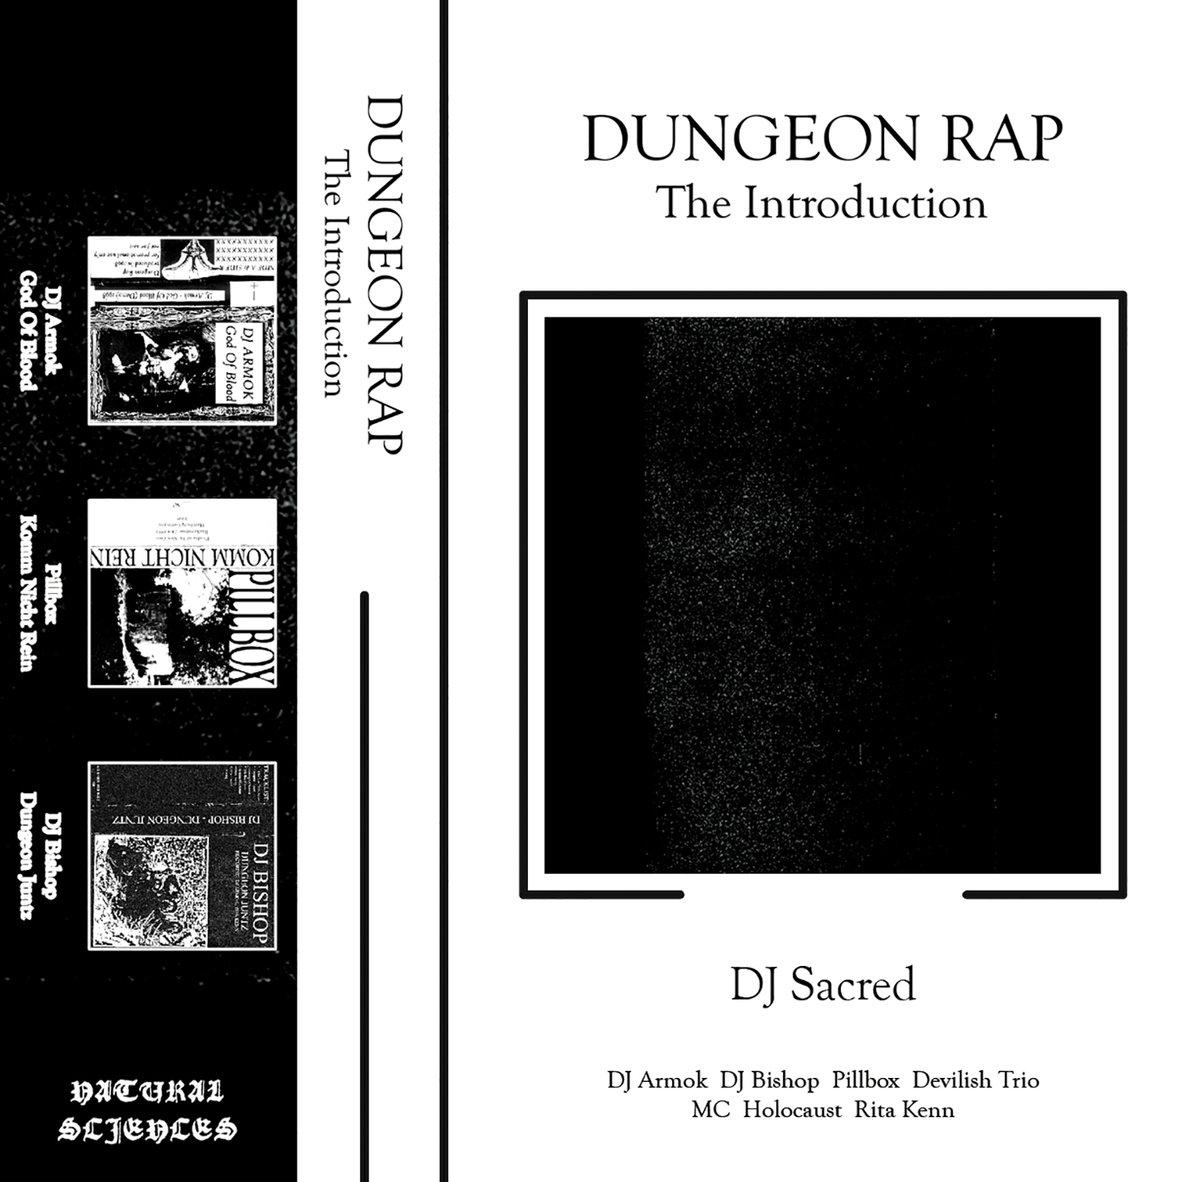 DJ Sacred blends hip hop and dark ambient on Dungeon Rap mixtape